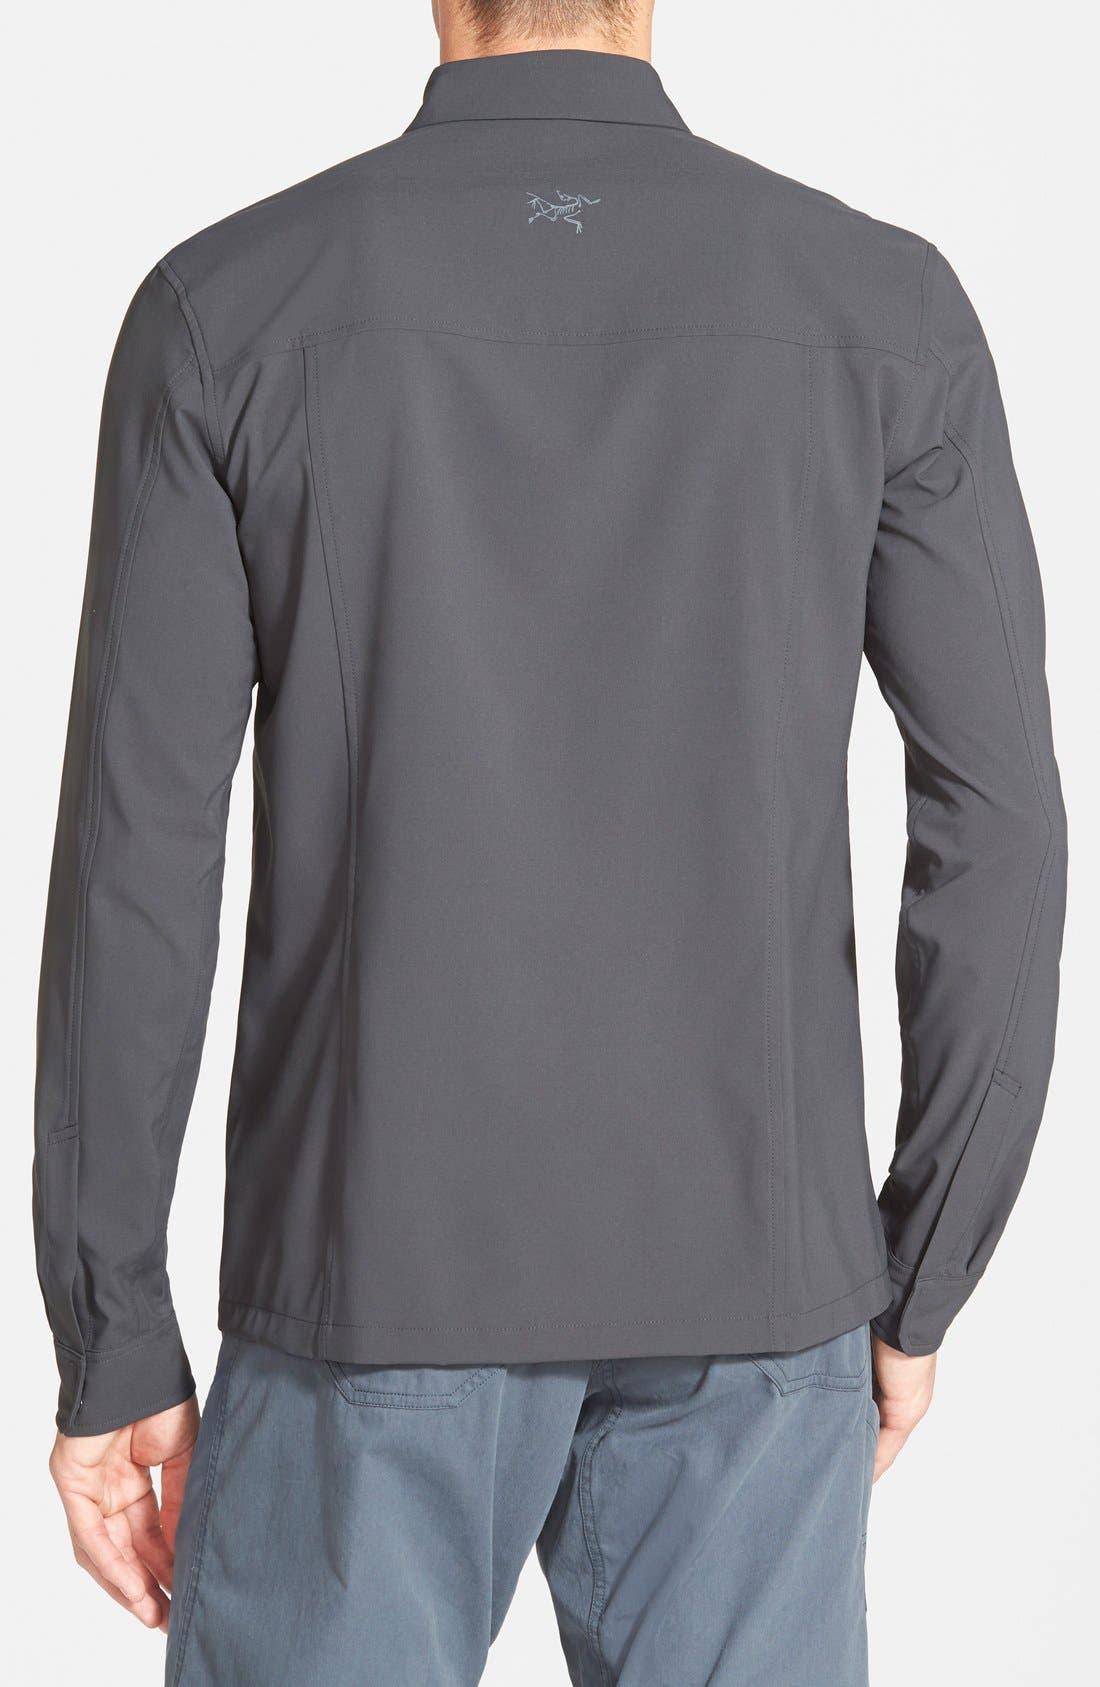 'Skyline' Trim Fit Sport Shirt,                             Alternate thumbnail 2, color,                             030